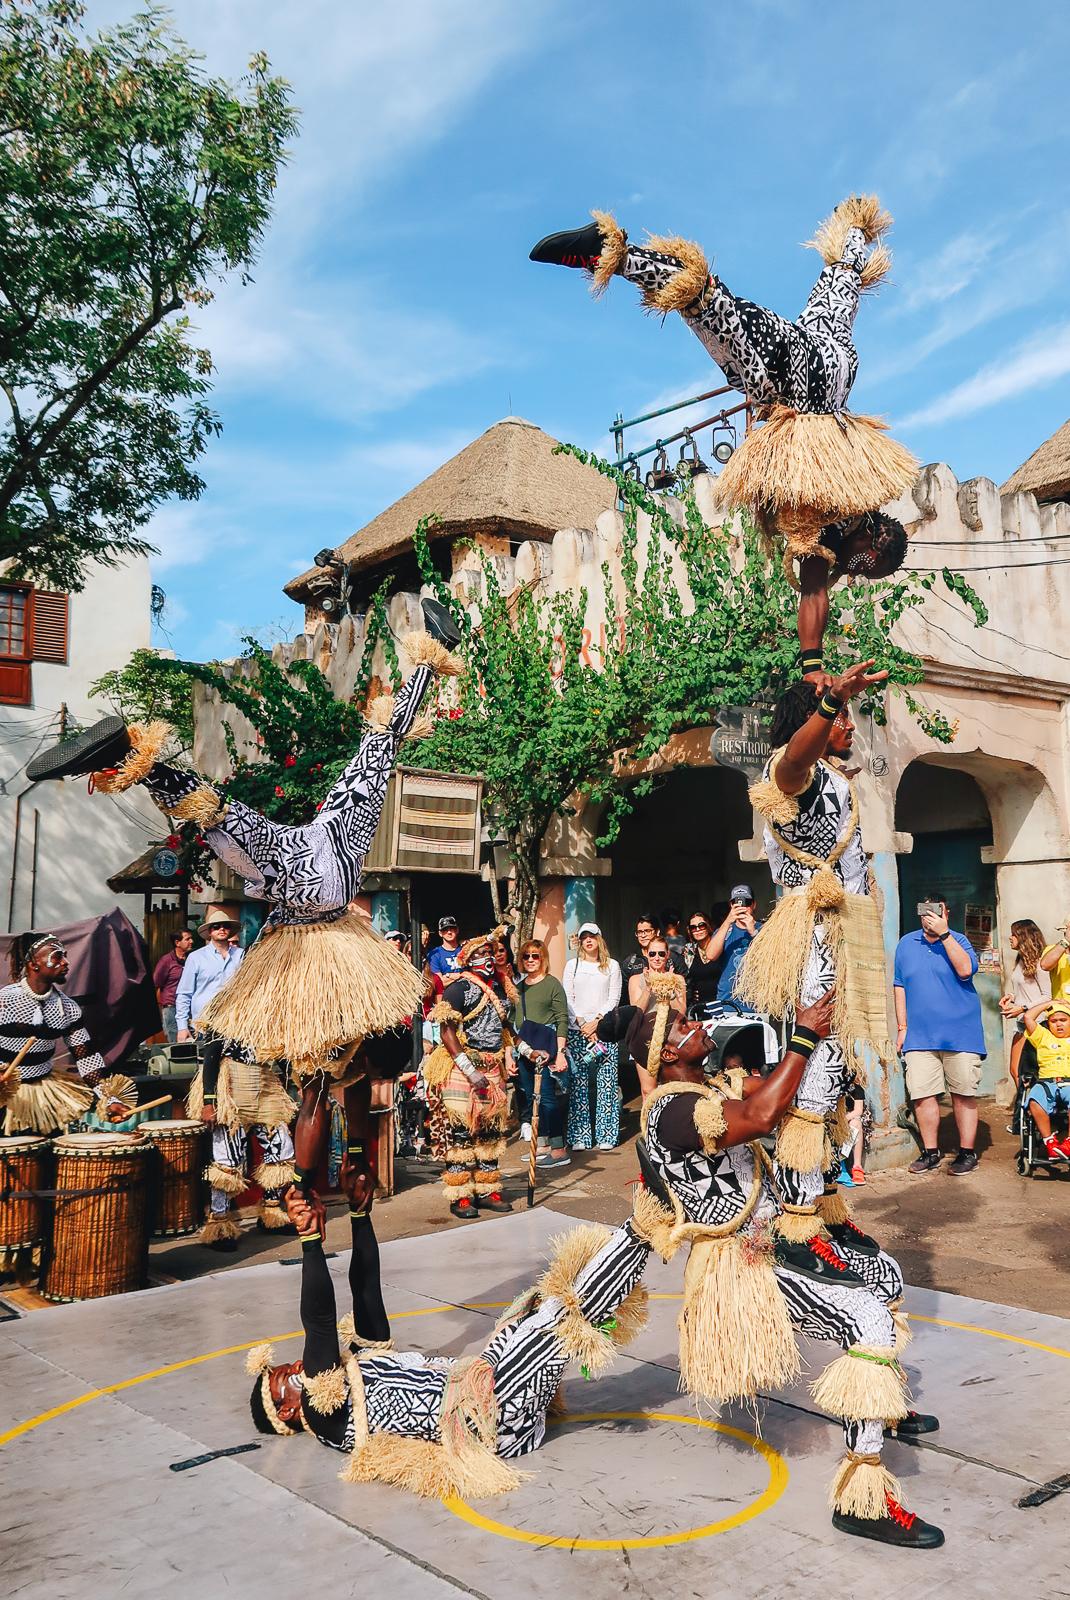 Disney's Animal Kingdom Travel Guide Eats Food Harambe Acrobats